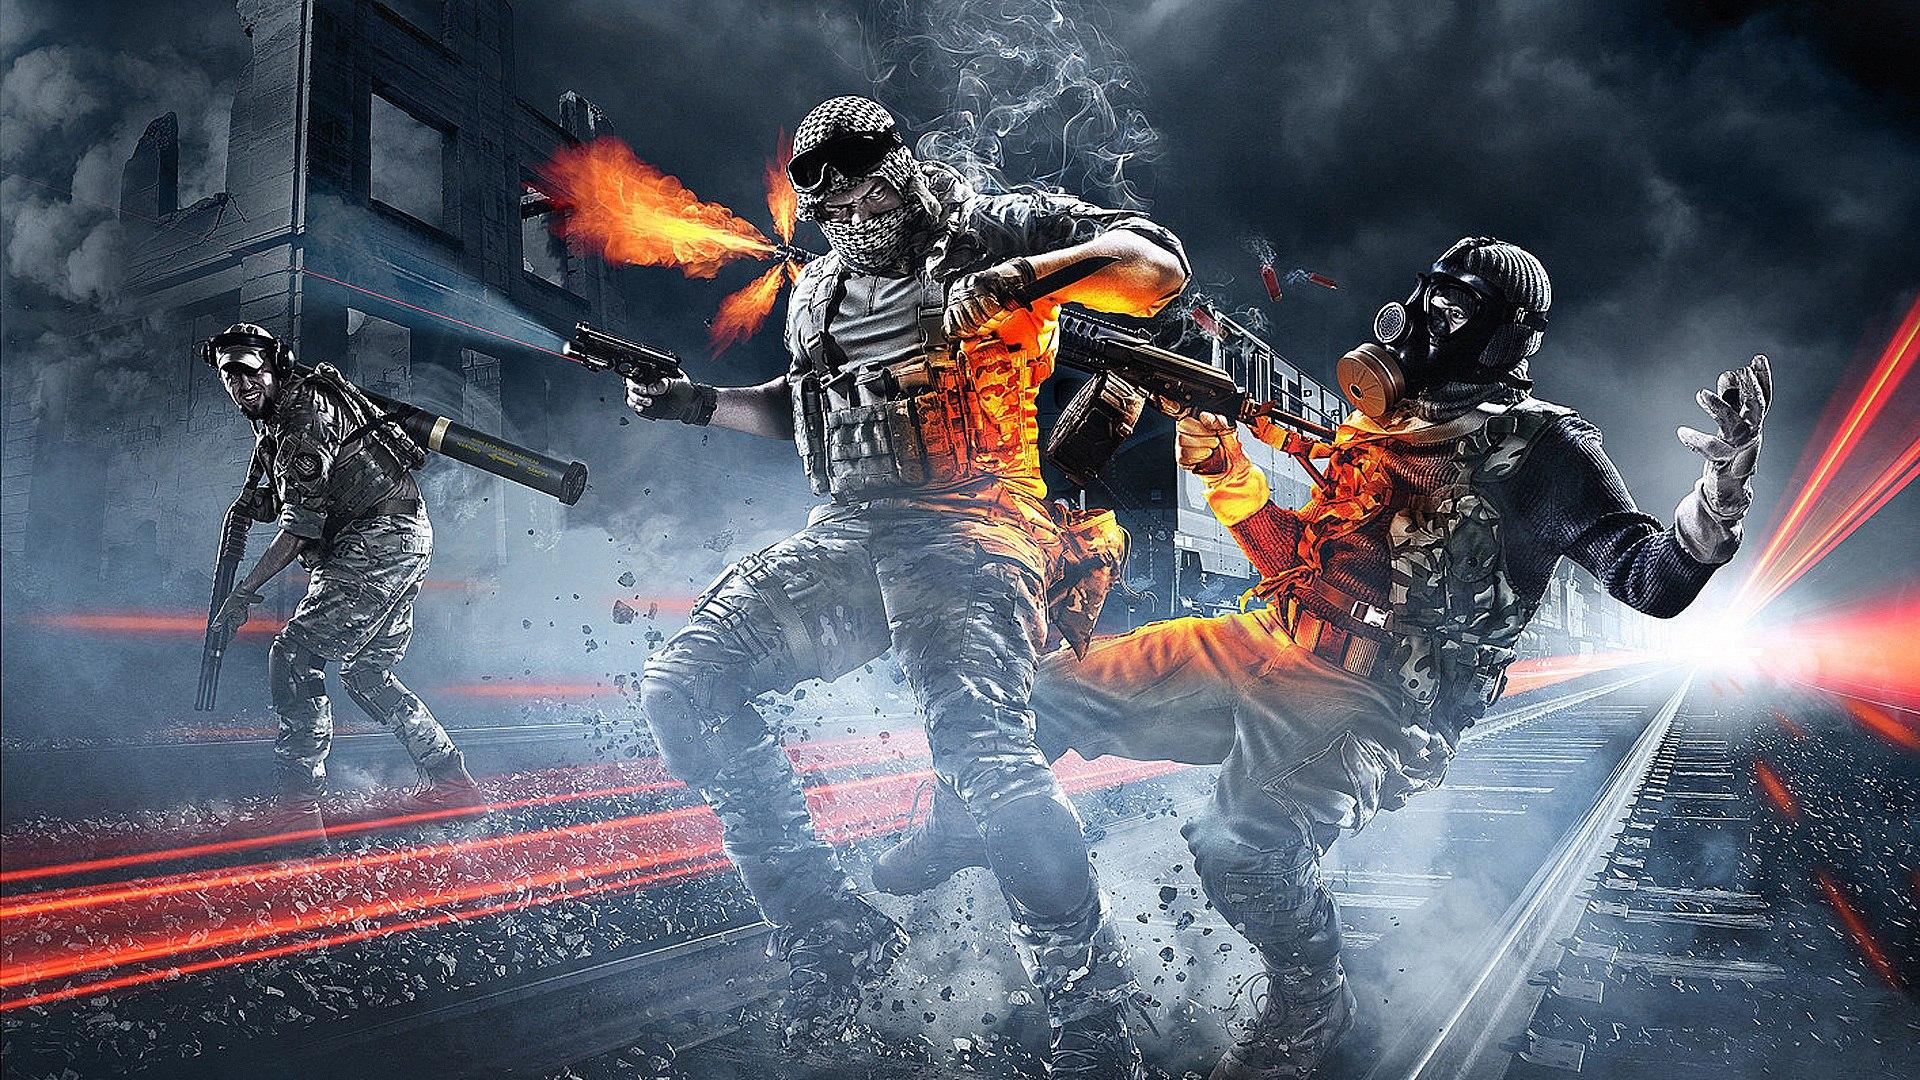 Games №0004 - Battlefield V Wallpaper Epic , HD Wallpaper & Backgrounds